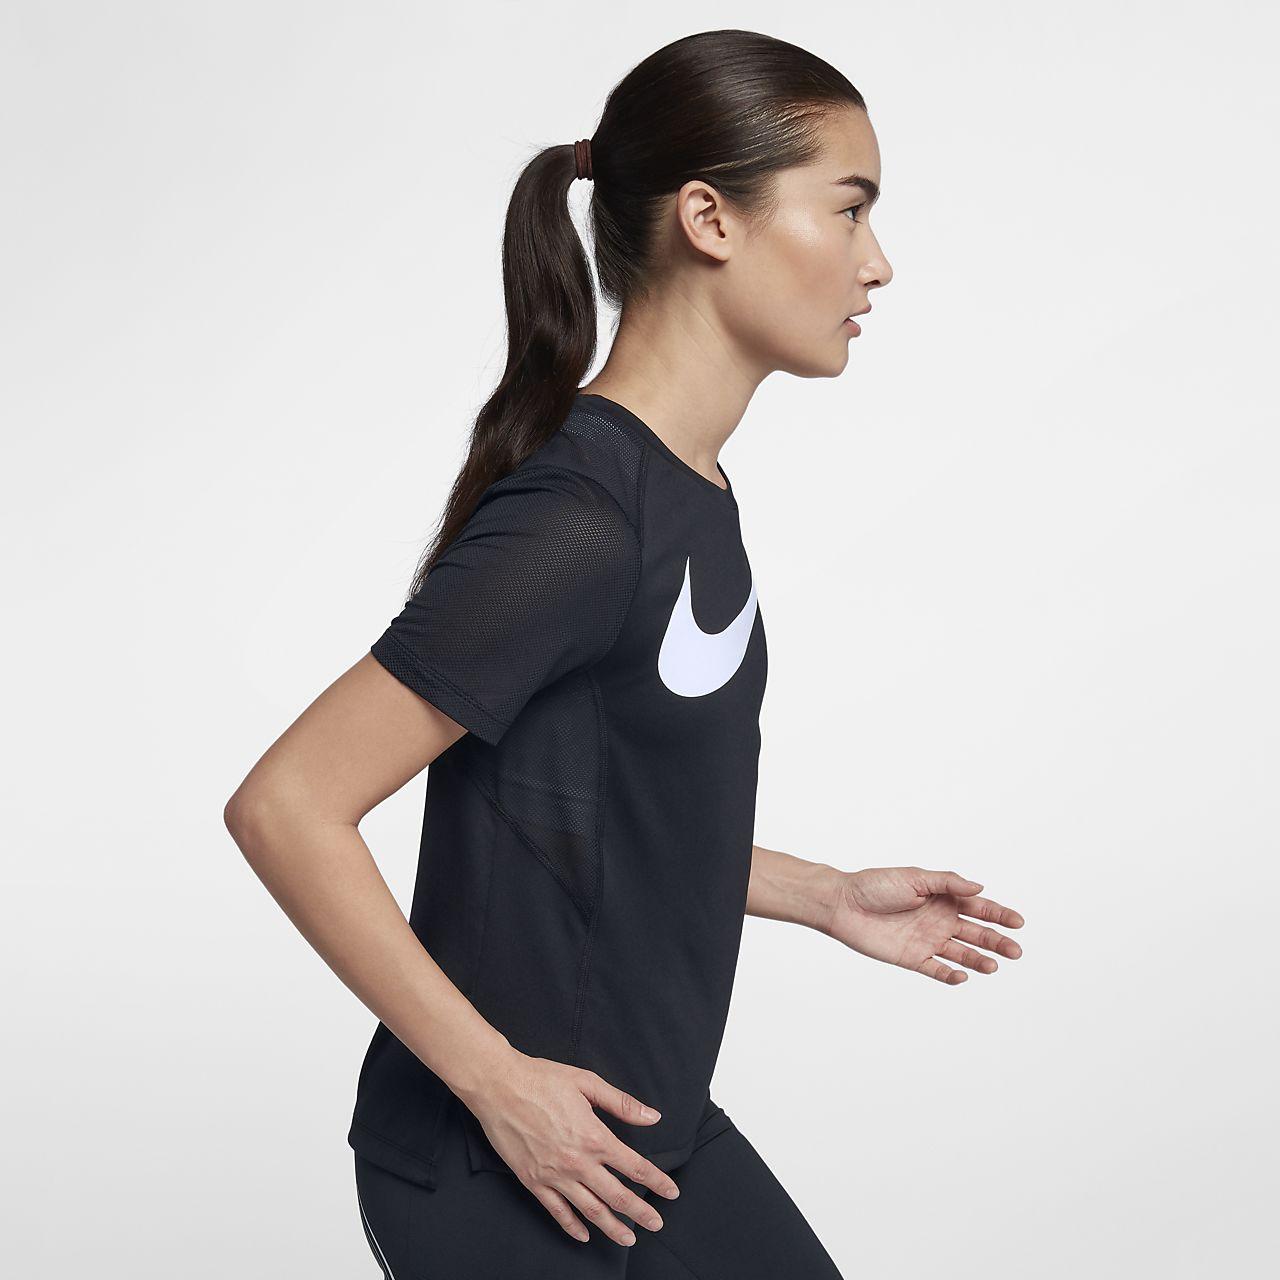 c9749b4c8858b Nike Miler Women s Short-Sleeve Running Top. Nike.com HR